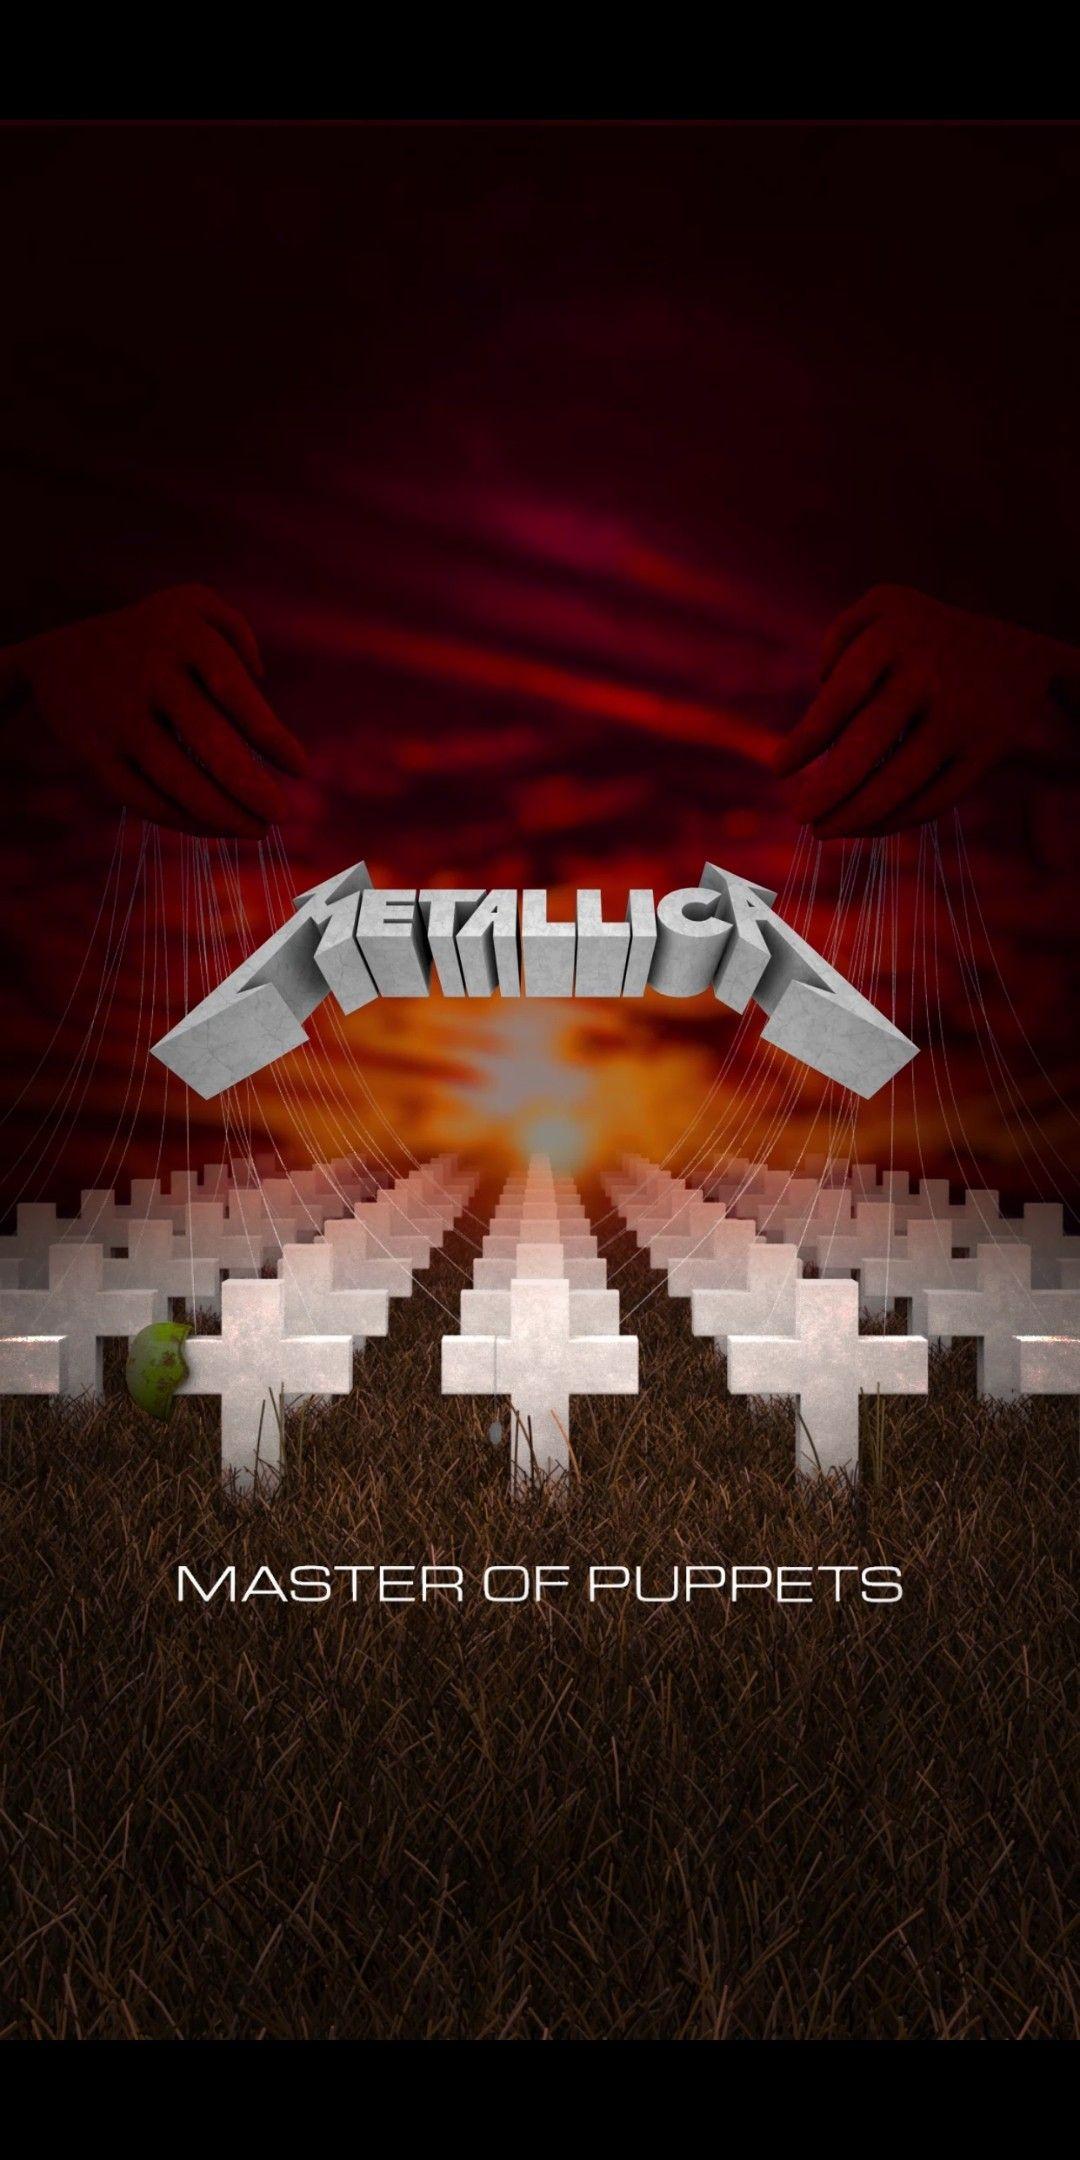 Metallica master of puppets wallpaper iPhone Metallica